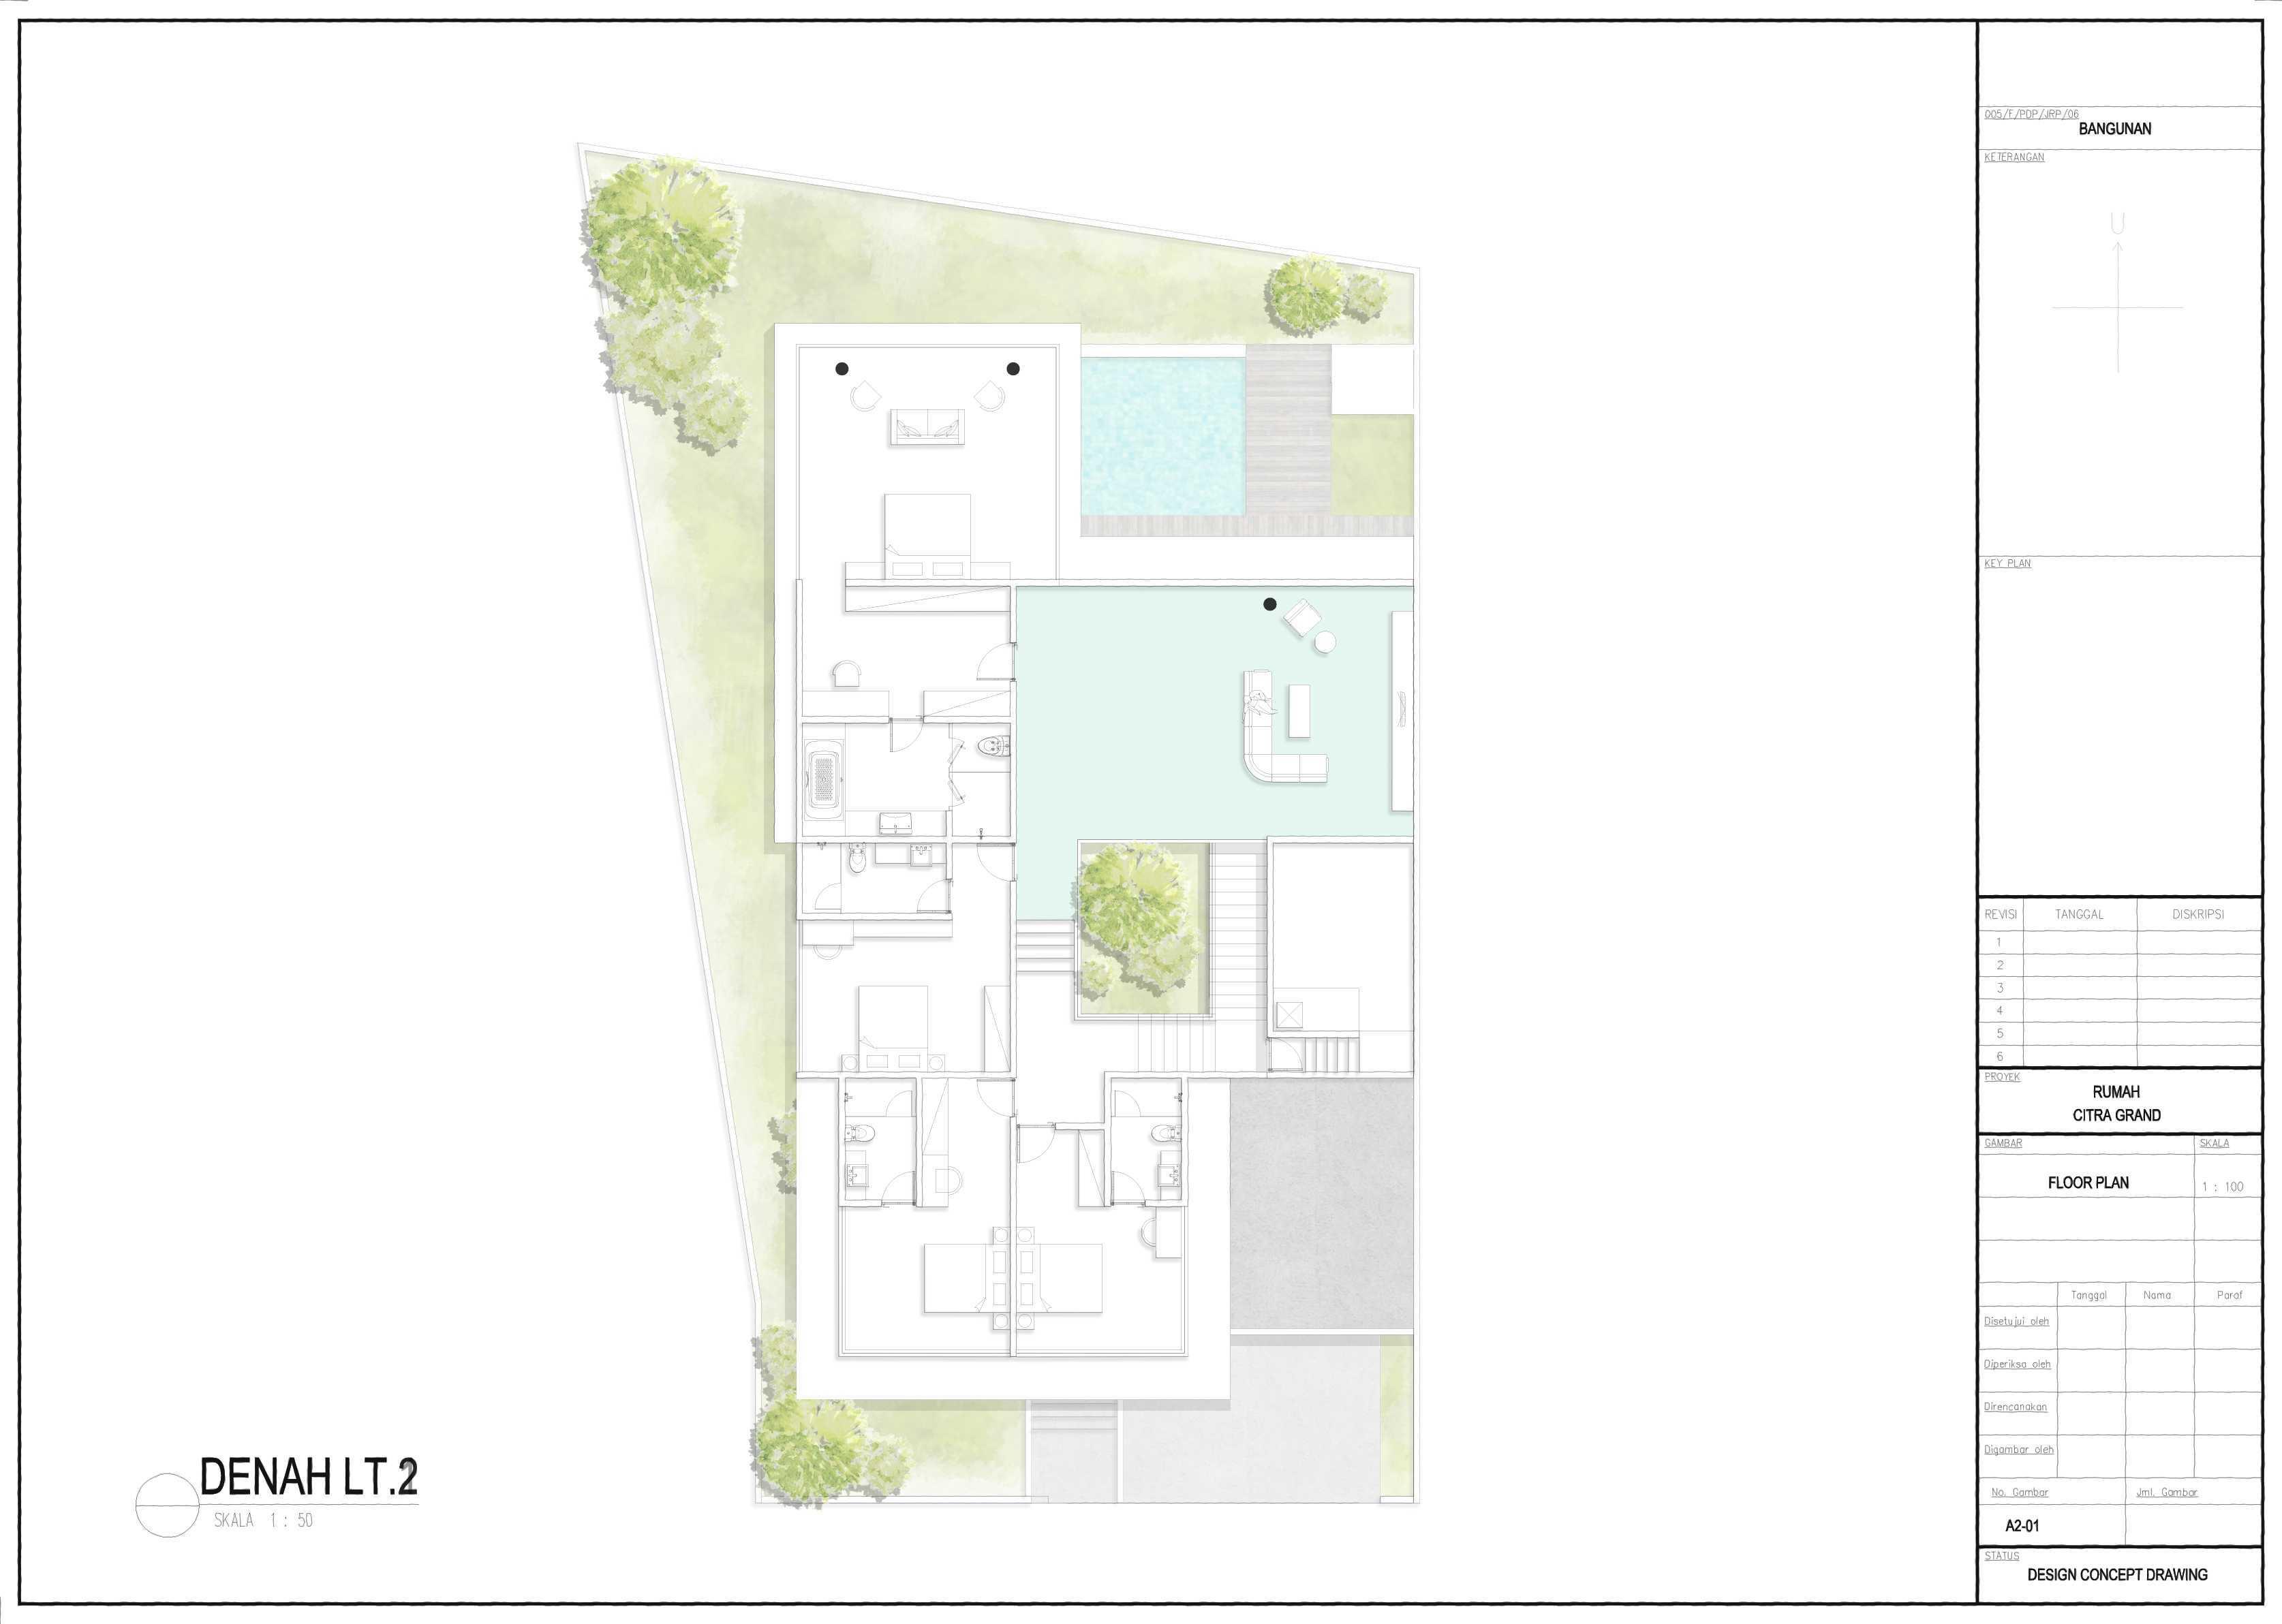 Mahastudio & Partner Italic House, Cibubur Jatisampurna, Kota Bks, Jawa Barat, Indonesia Jatisampurna, Kota Bks, Jawa Barat, Indonesia Mahastudio-Partner-Italic-House-Cibubur   65450